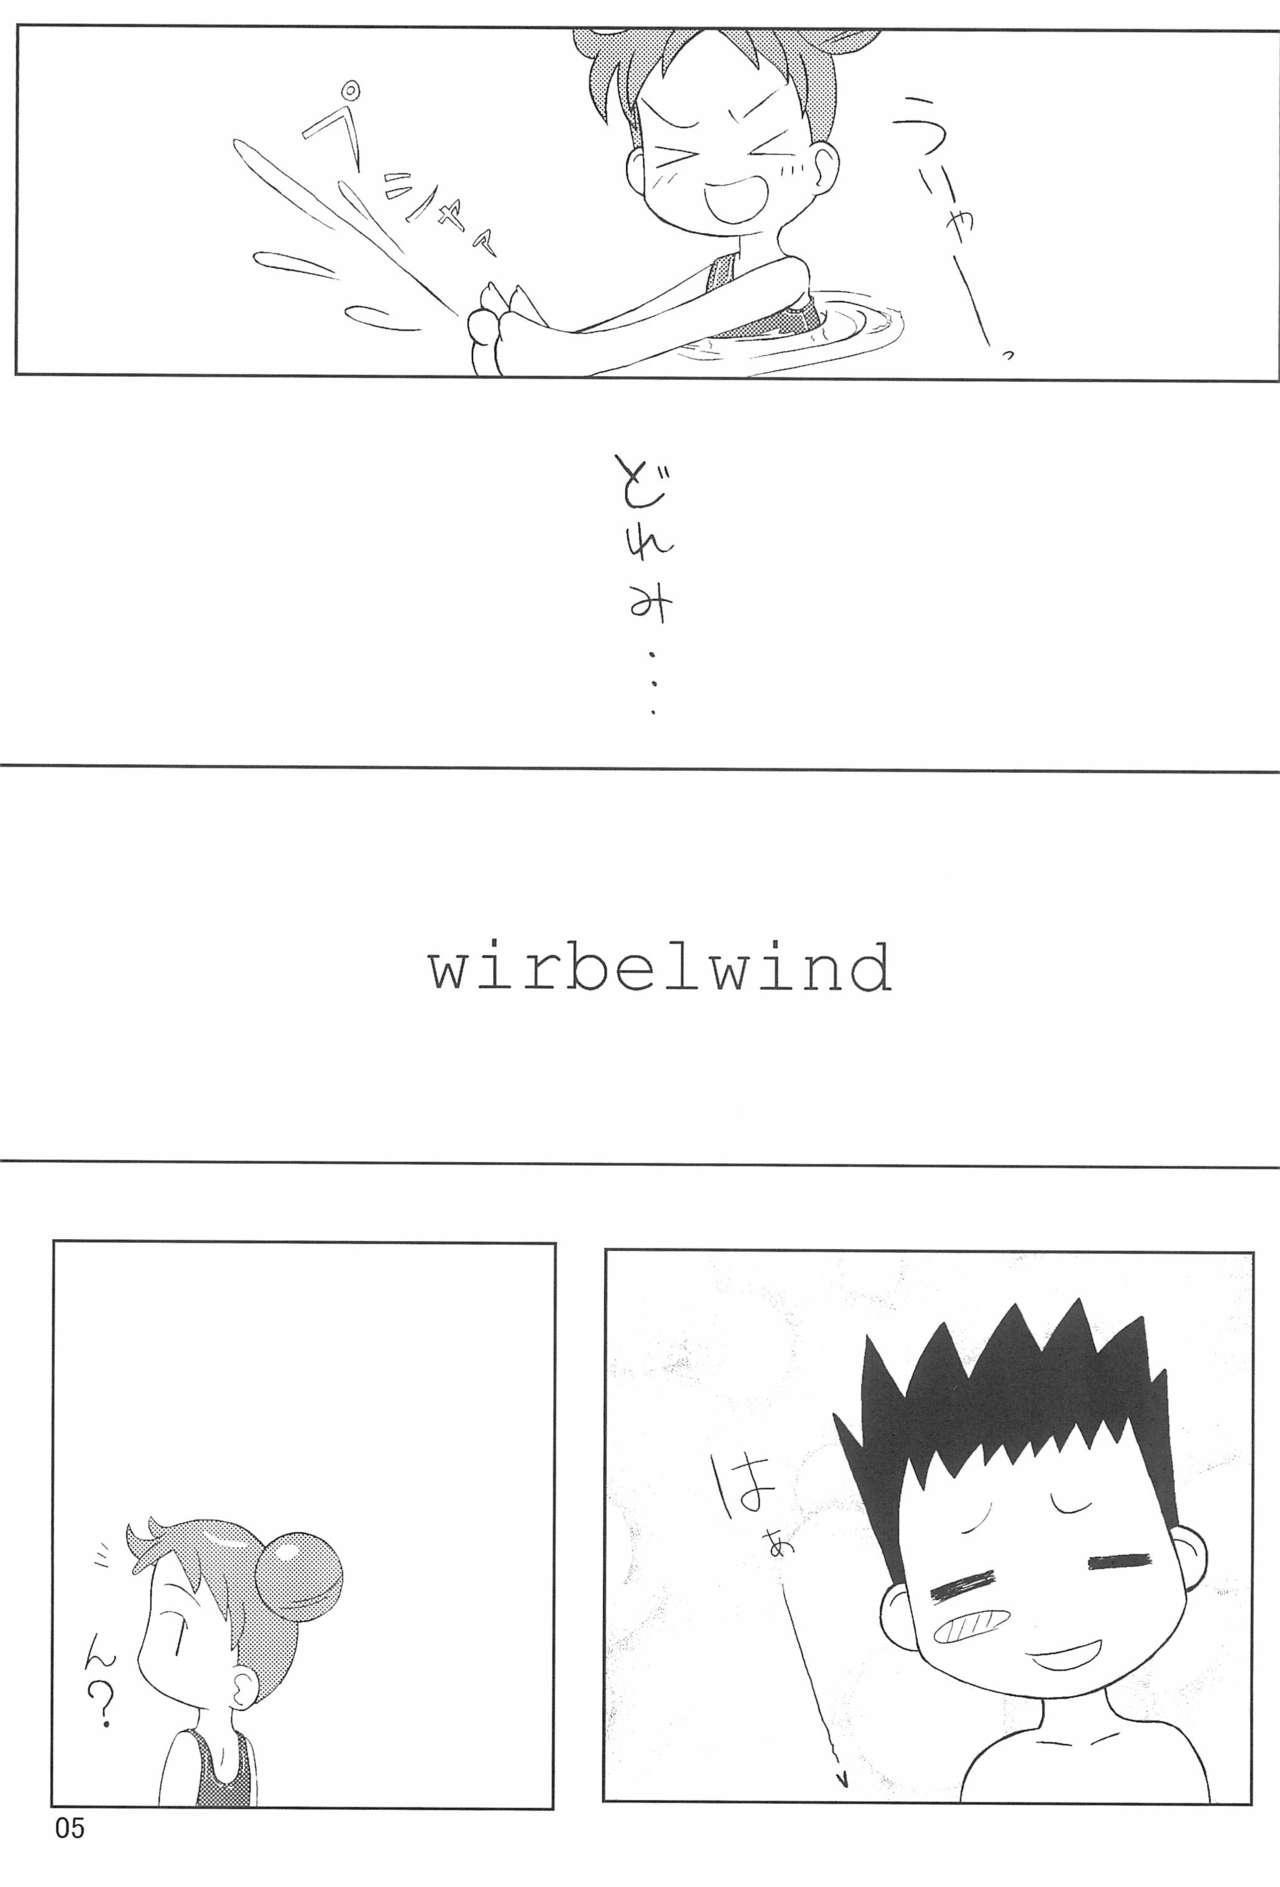 Wirbelwind 4